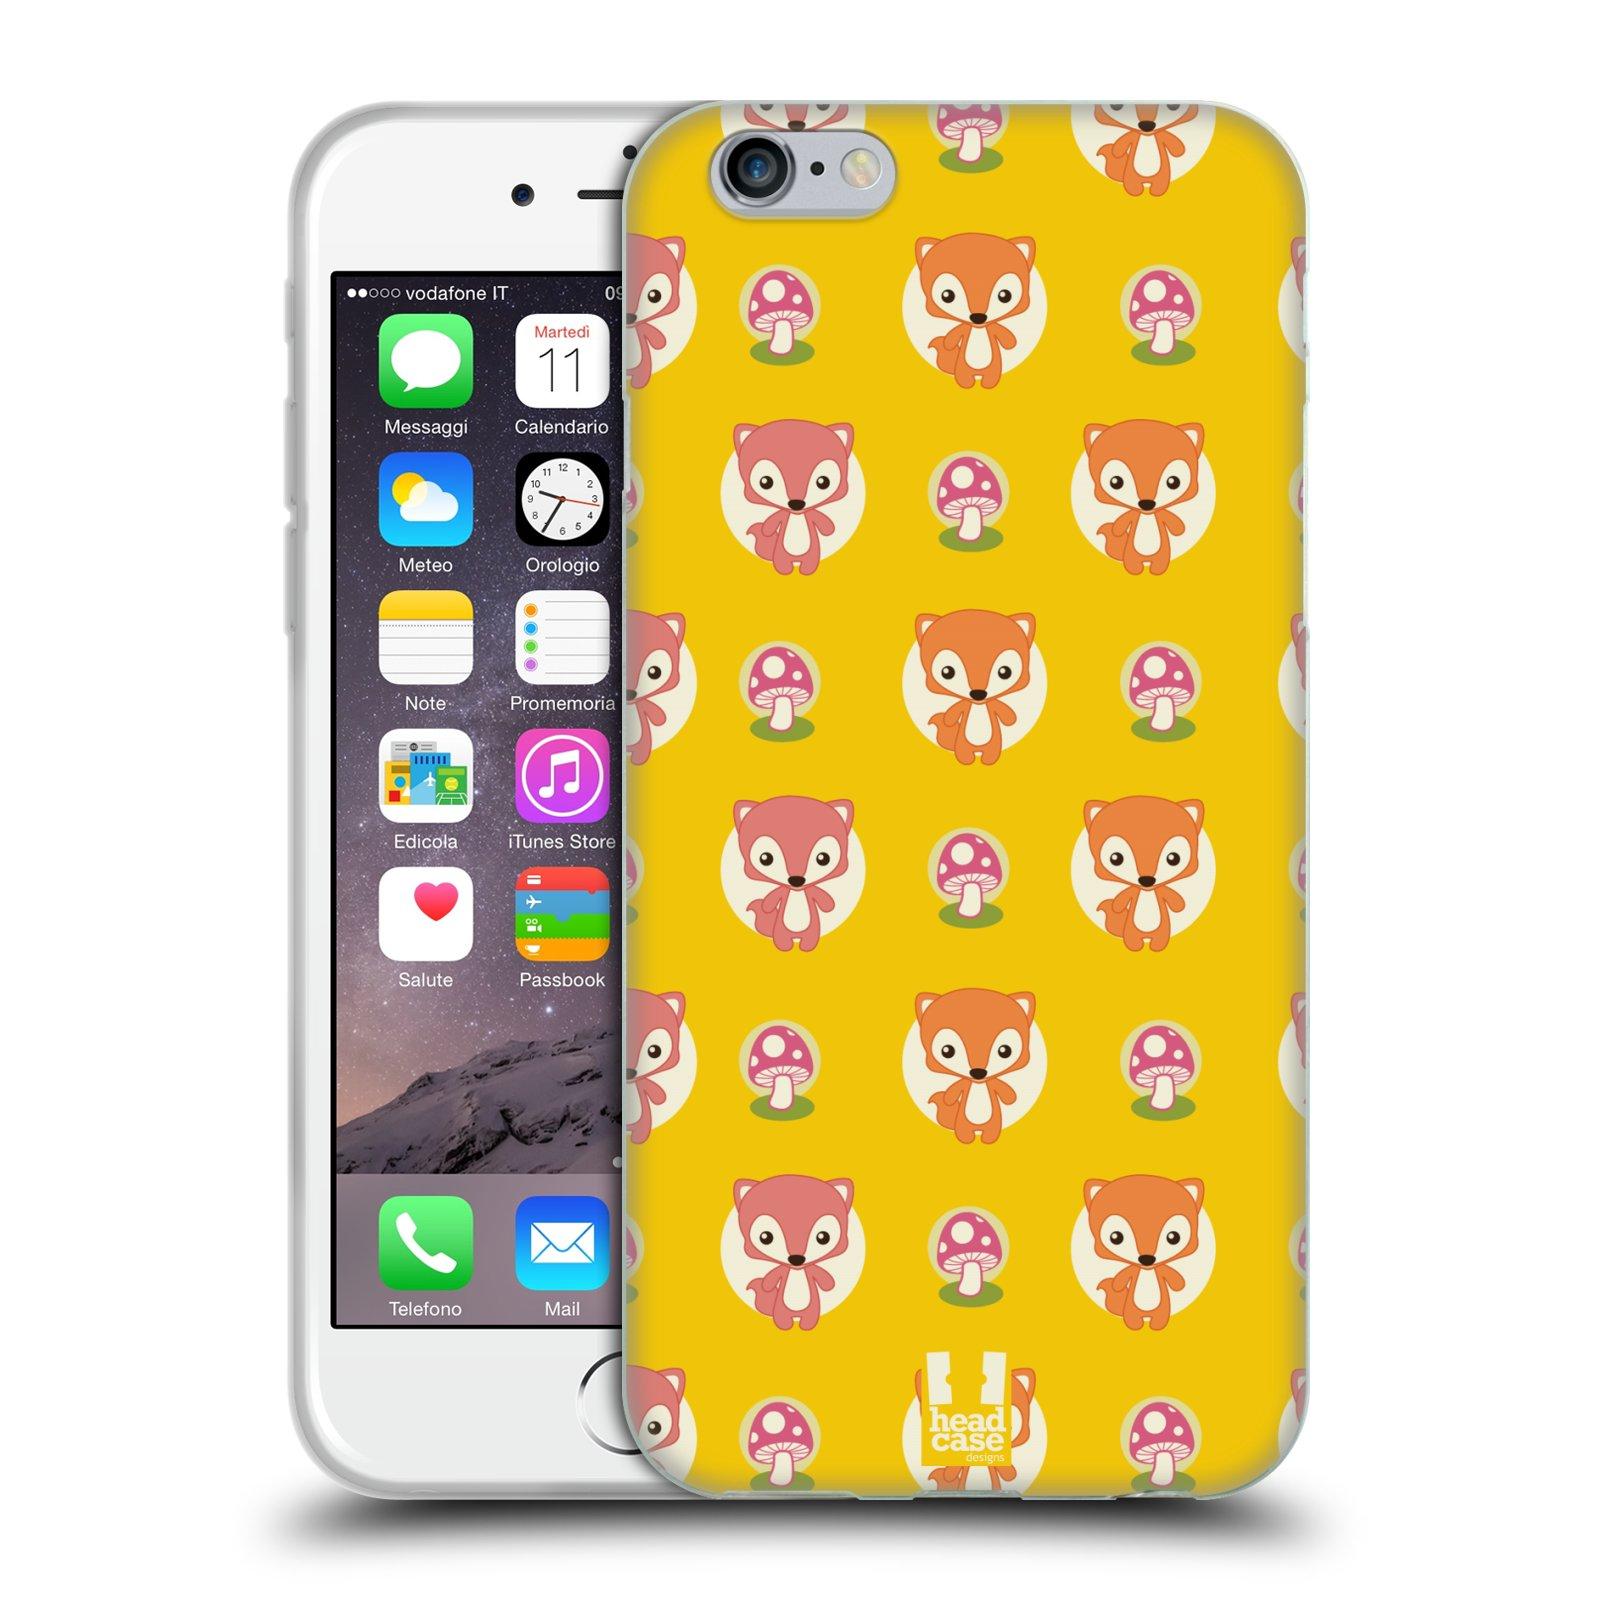 HEAD CASE silikonový obal na mobil Apple Iphone 6/6S vzor roztomilé zvířecí vzory lištičky